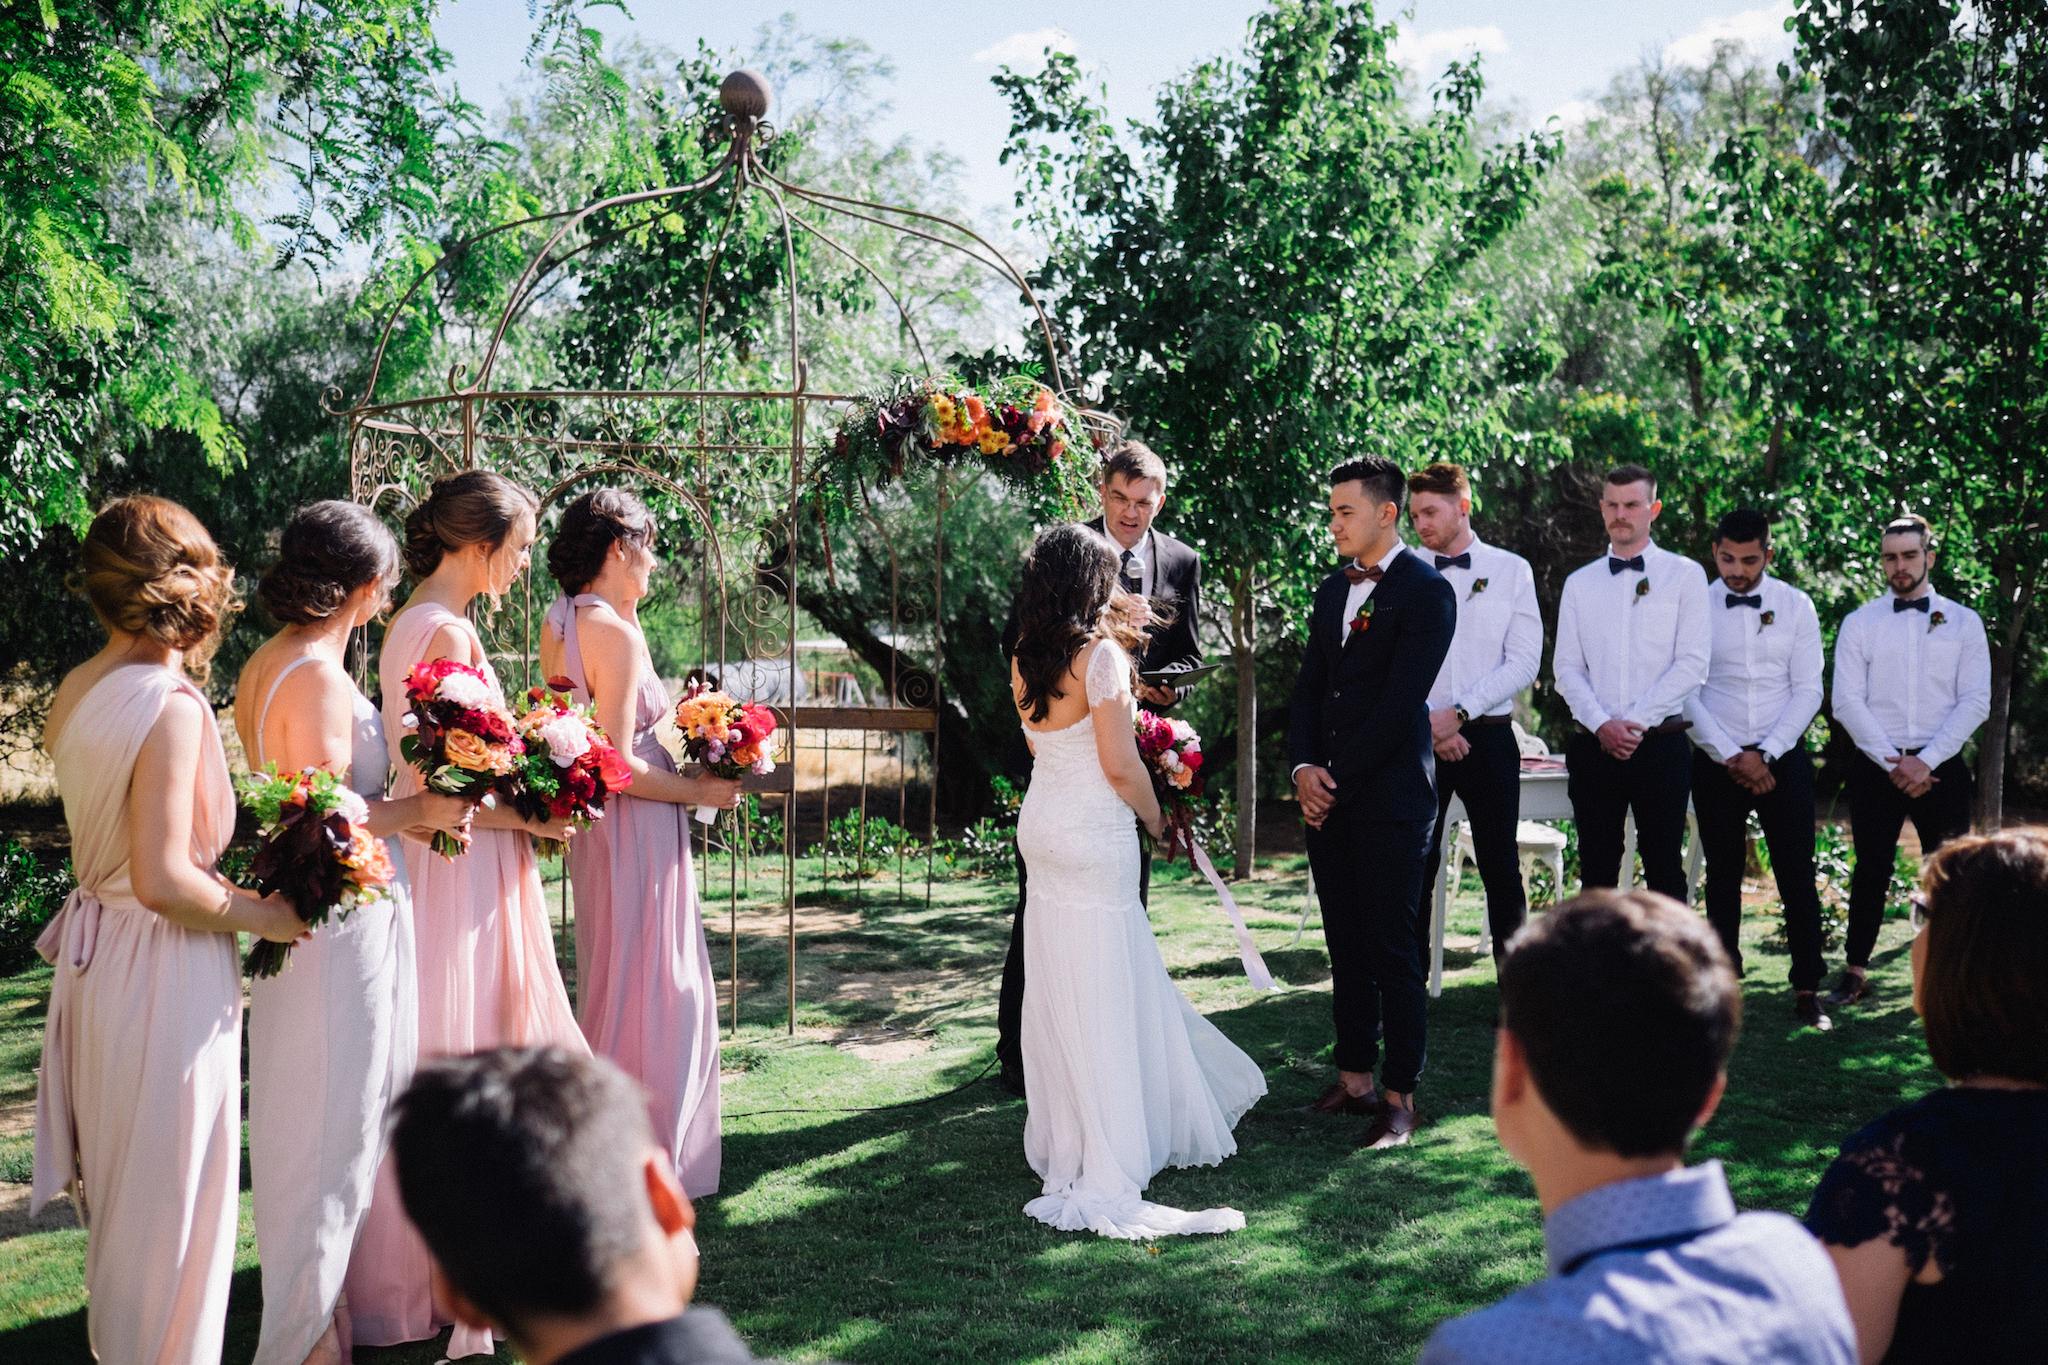 Laurelville Manor Ceremony Sarah Marvin York Wedding Photographer 10